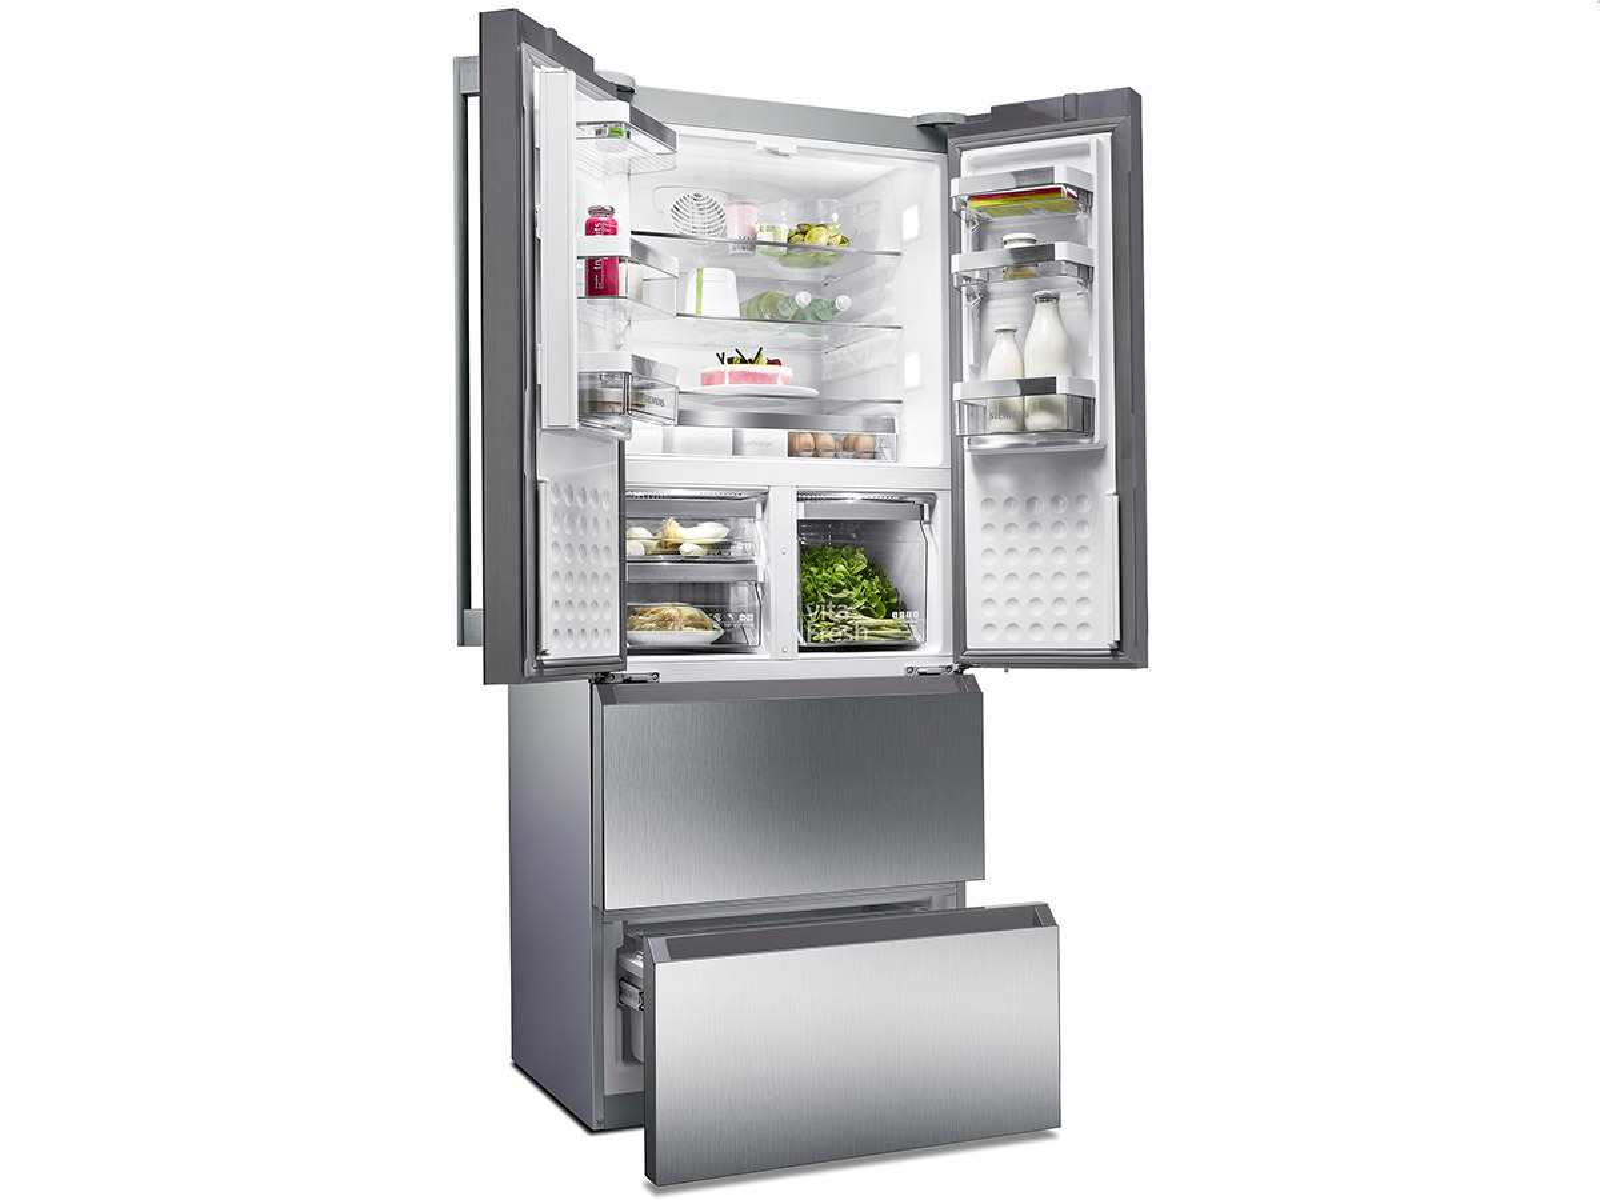 Siemens KM40FAI20 Frenchdoor Kühl-Gefrier-Kombination Edelstahl-Türen